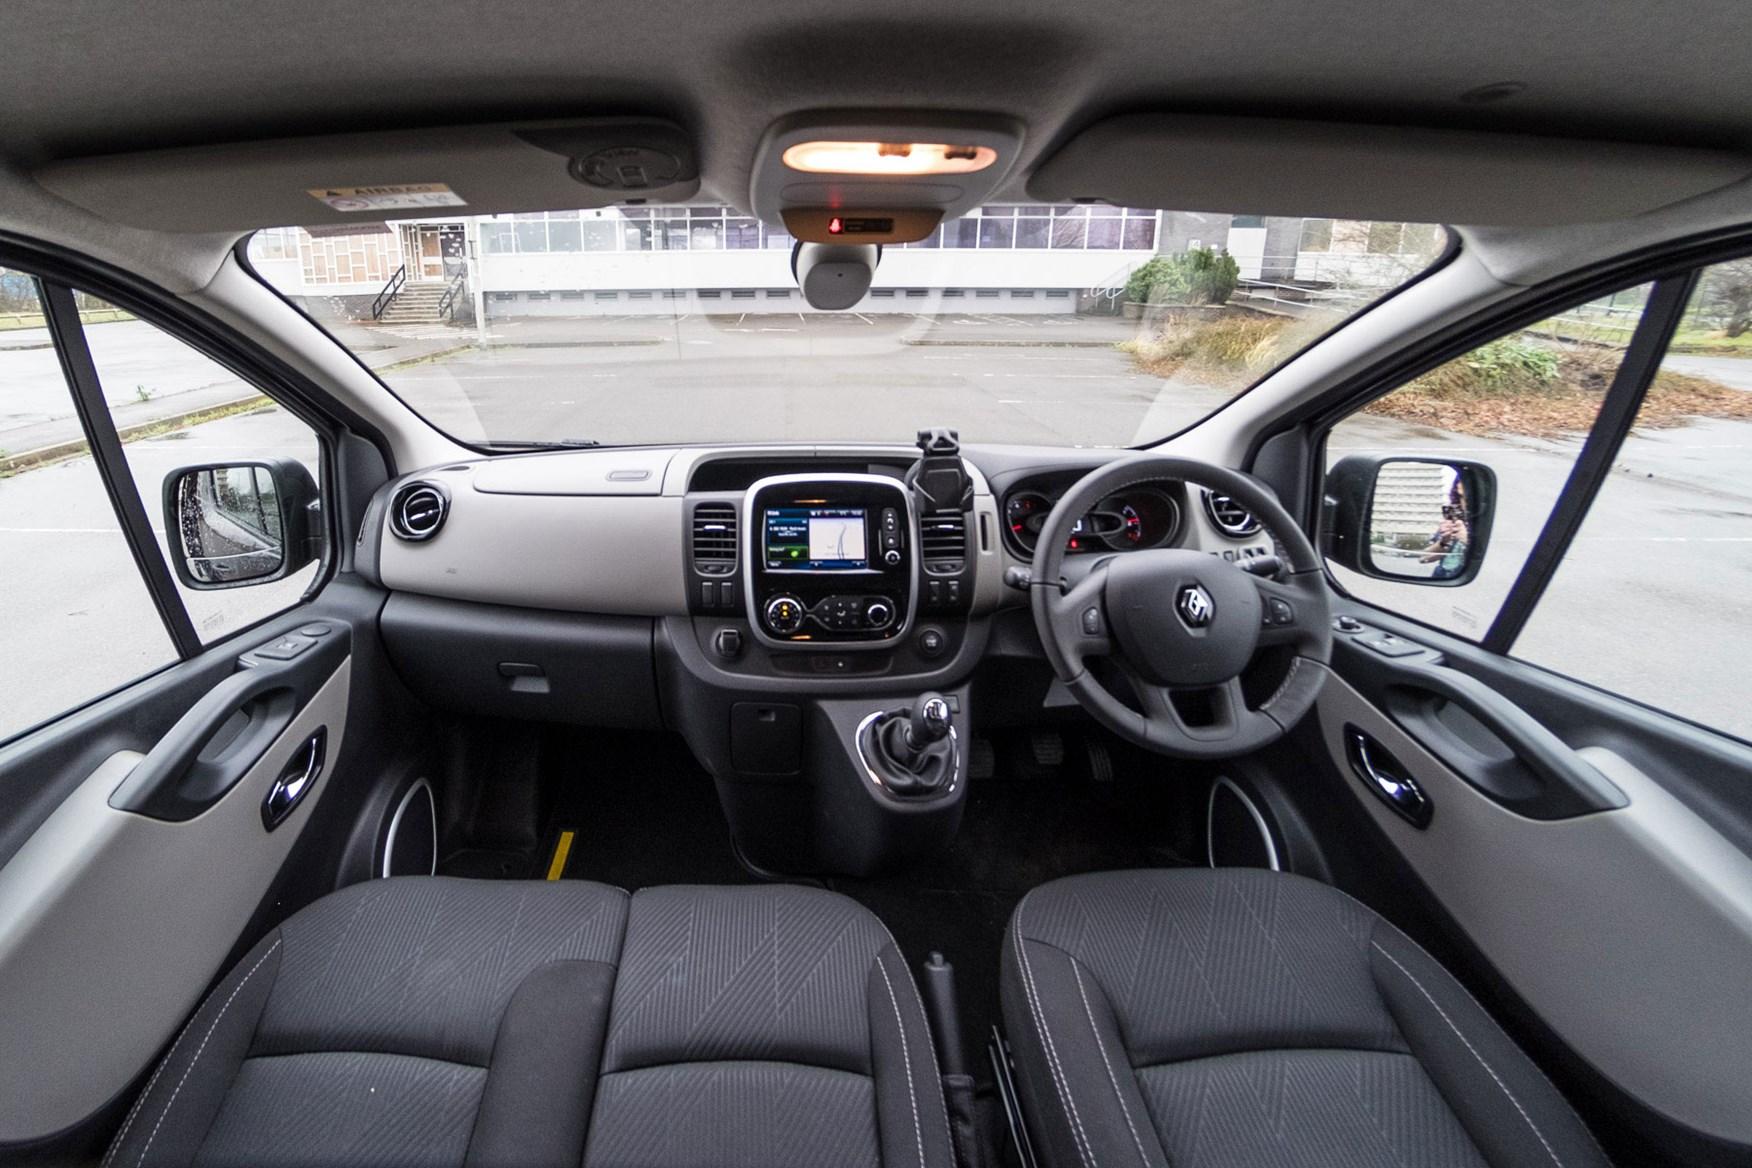 Renault Trafic Formula Edition review - cab interior